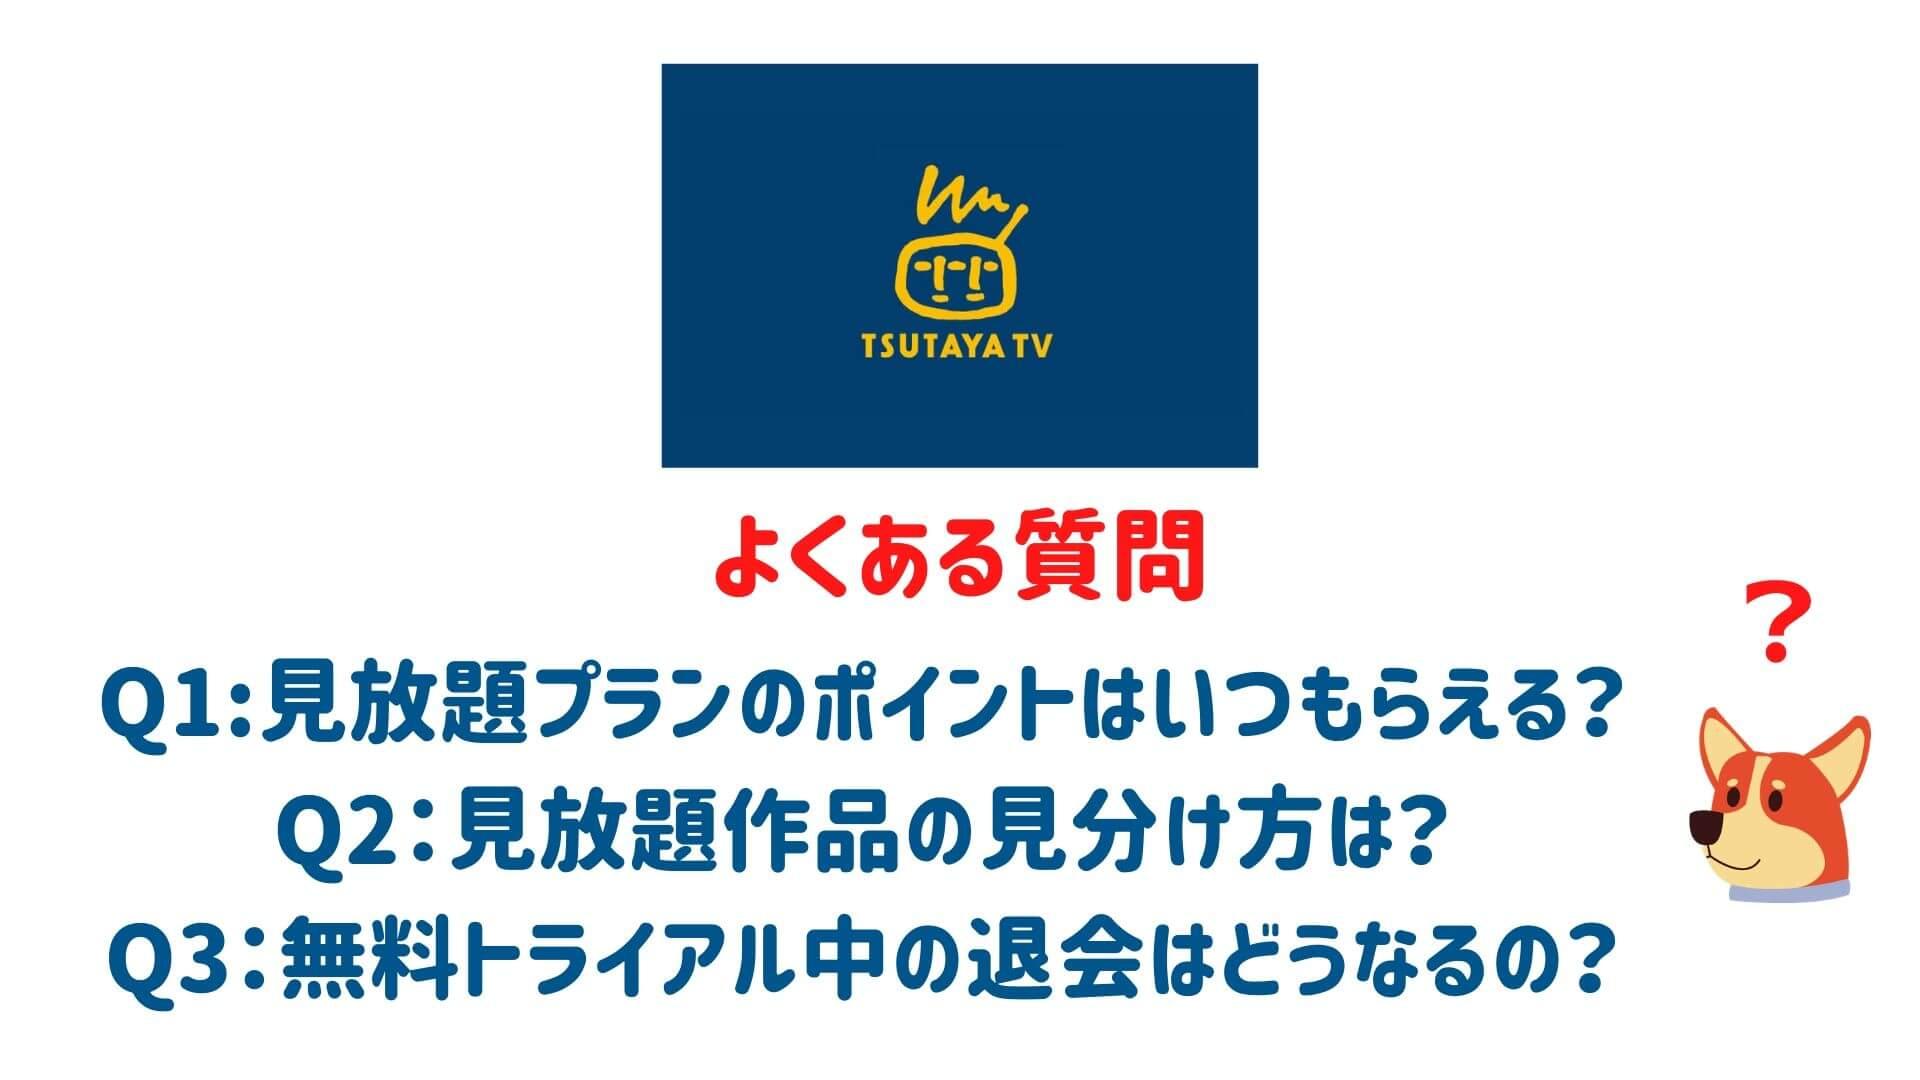 TSUTAYA TVのよくある質問しついて解答している